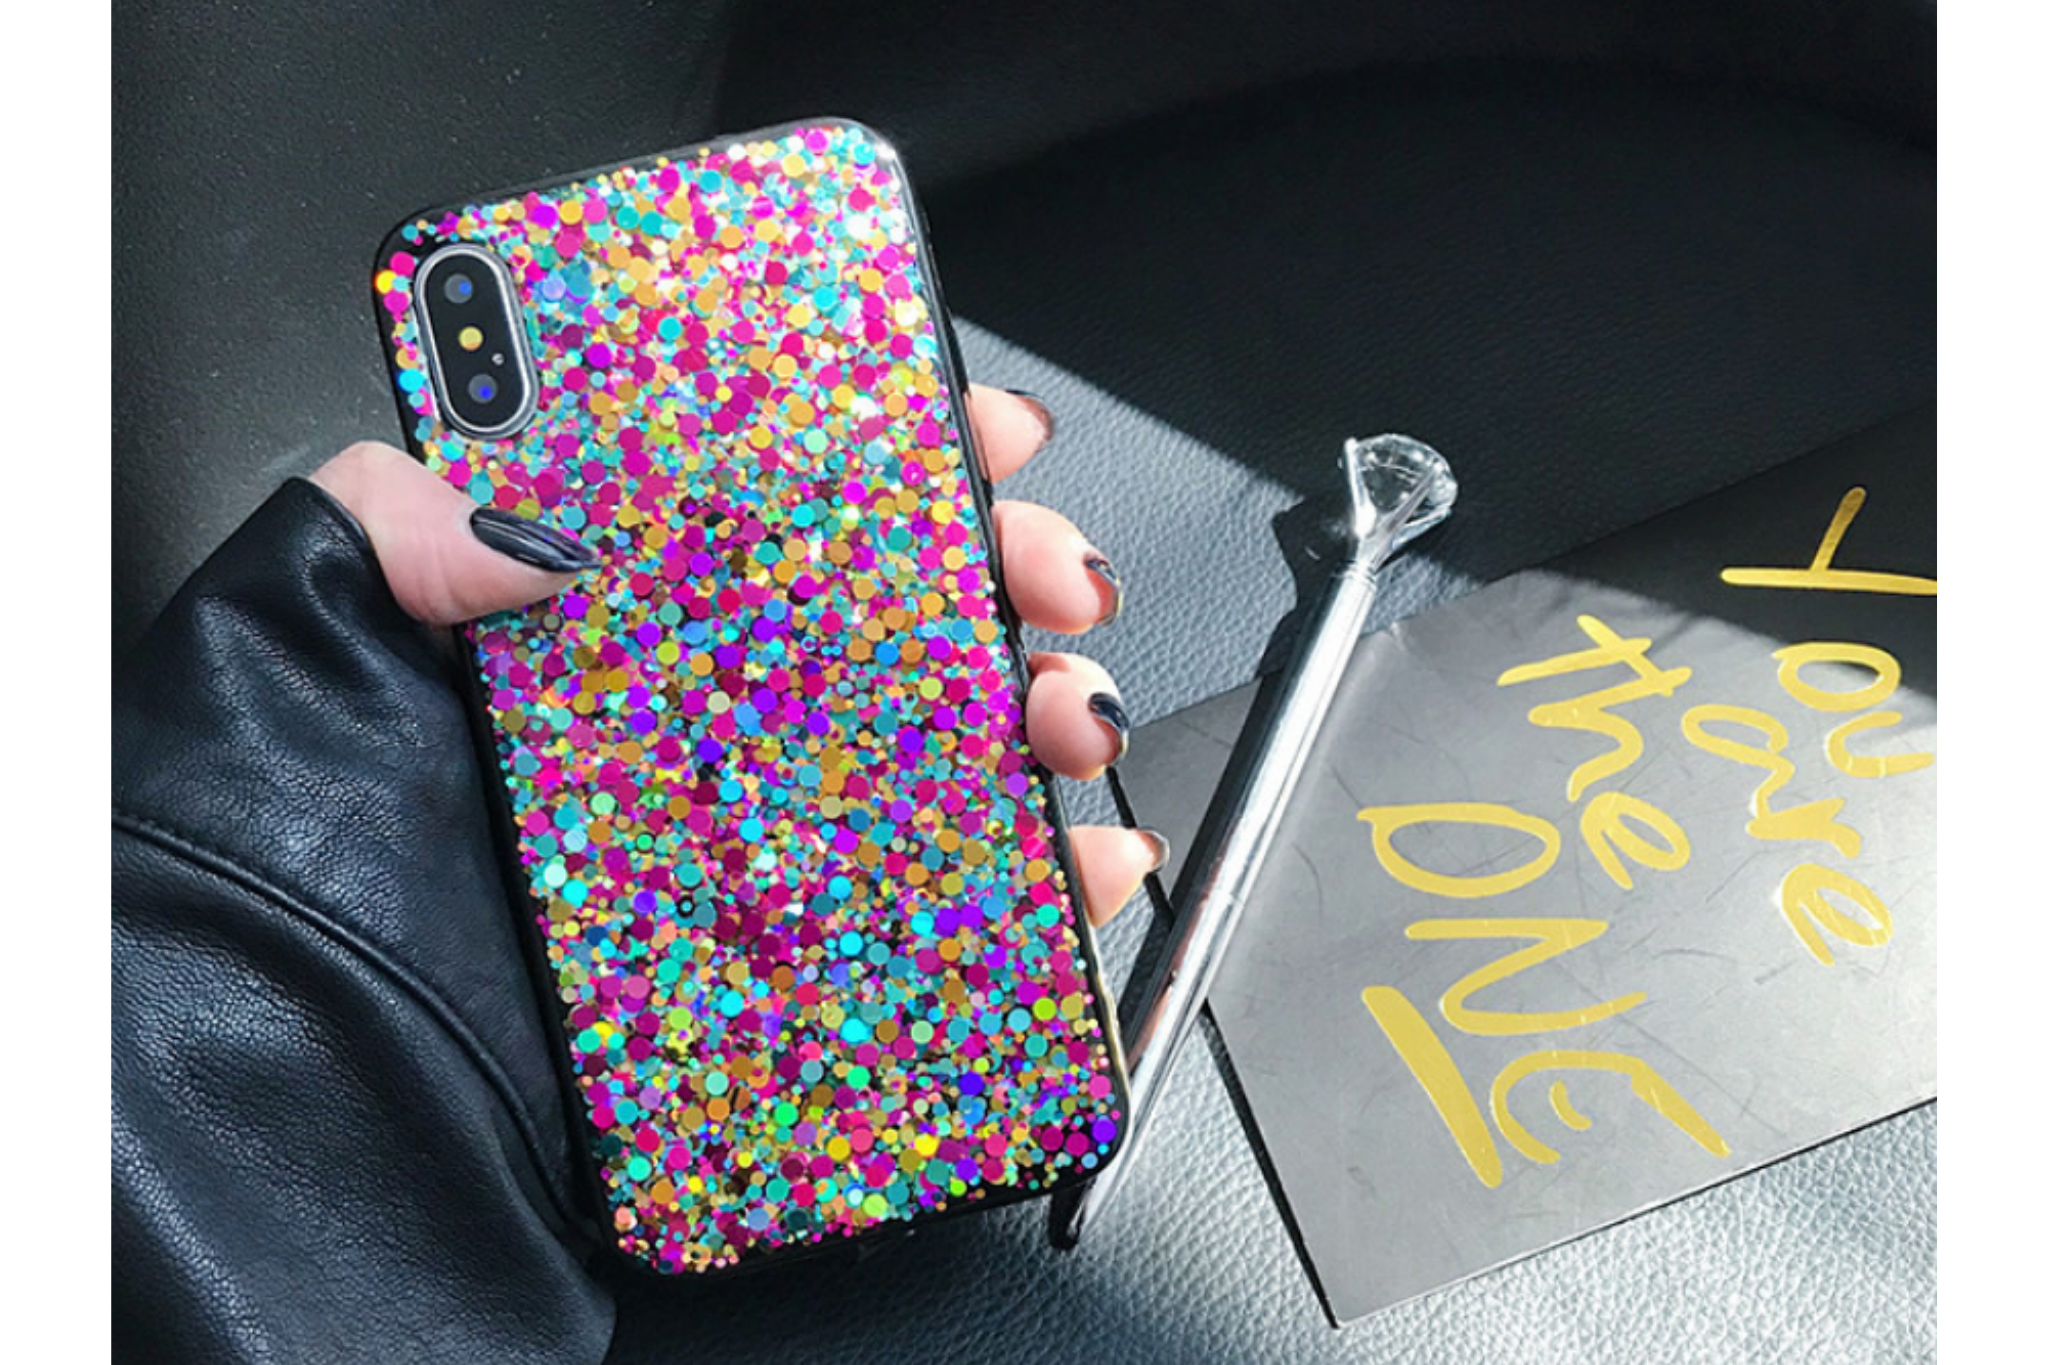 Smartphonehoesje iPhone XS Max | Bling met glitters | Multicolor